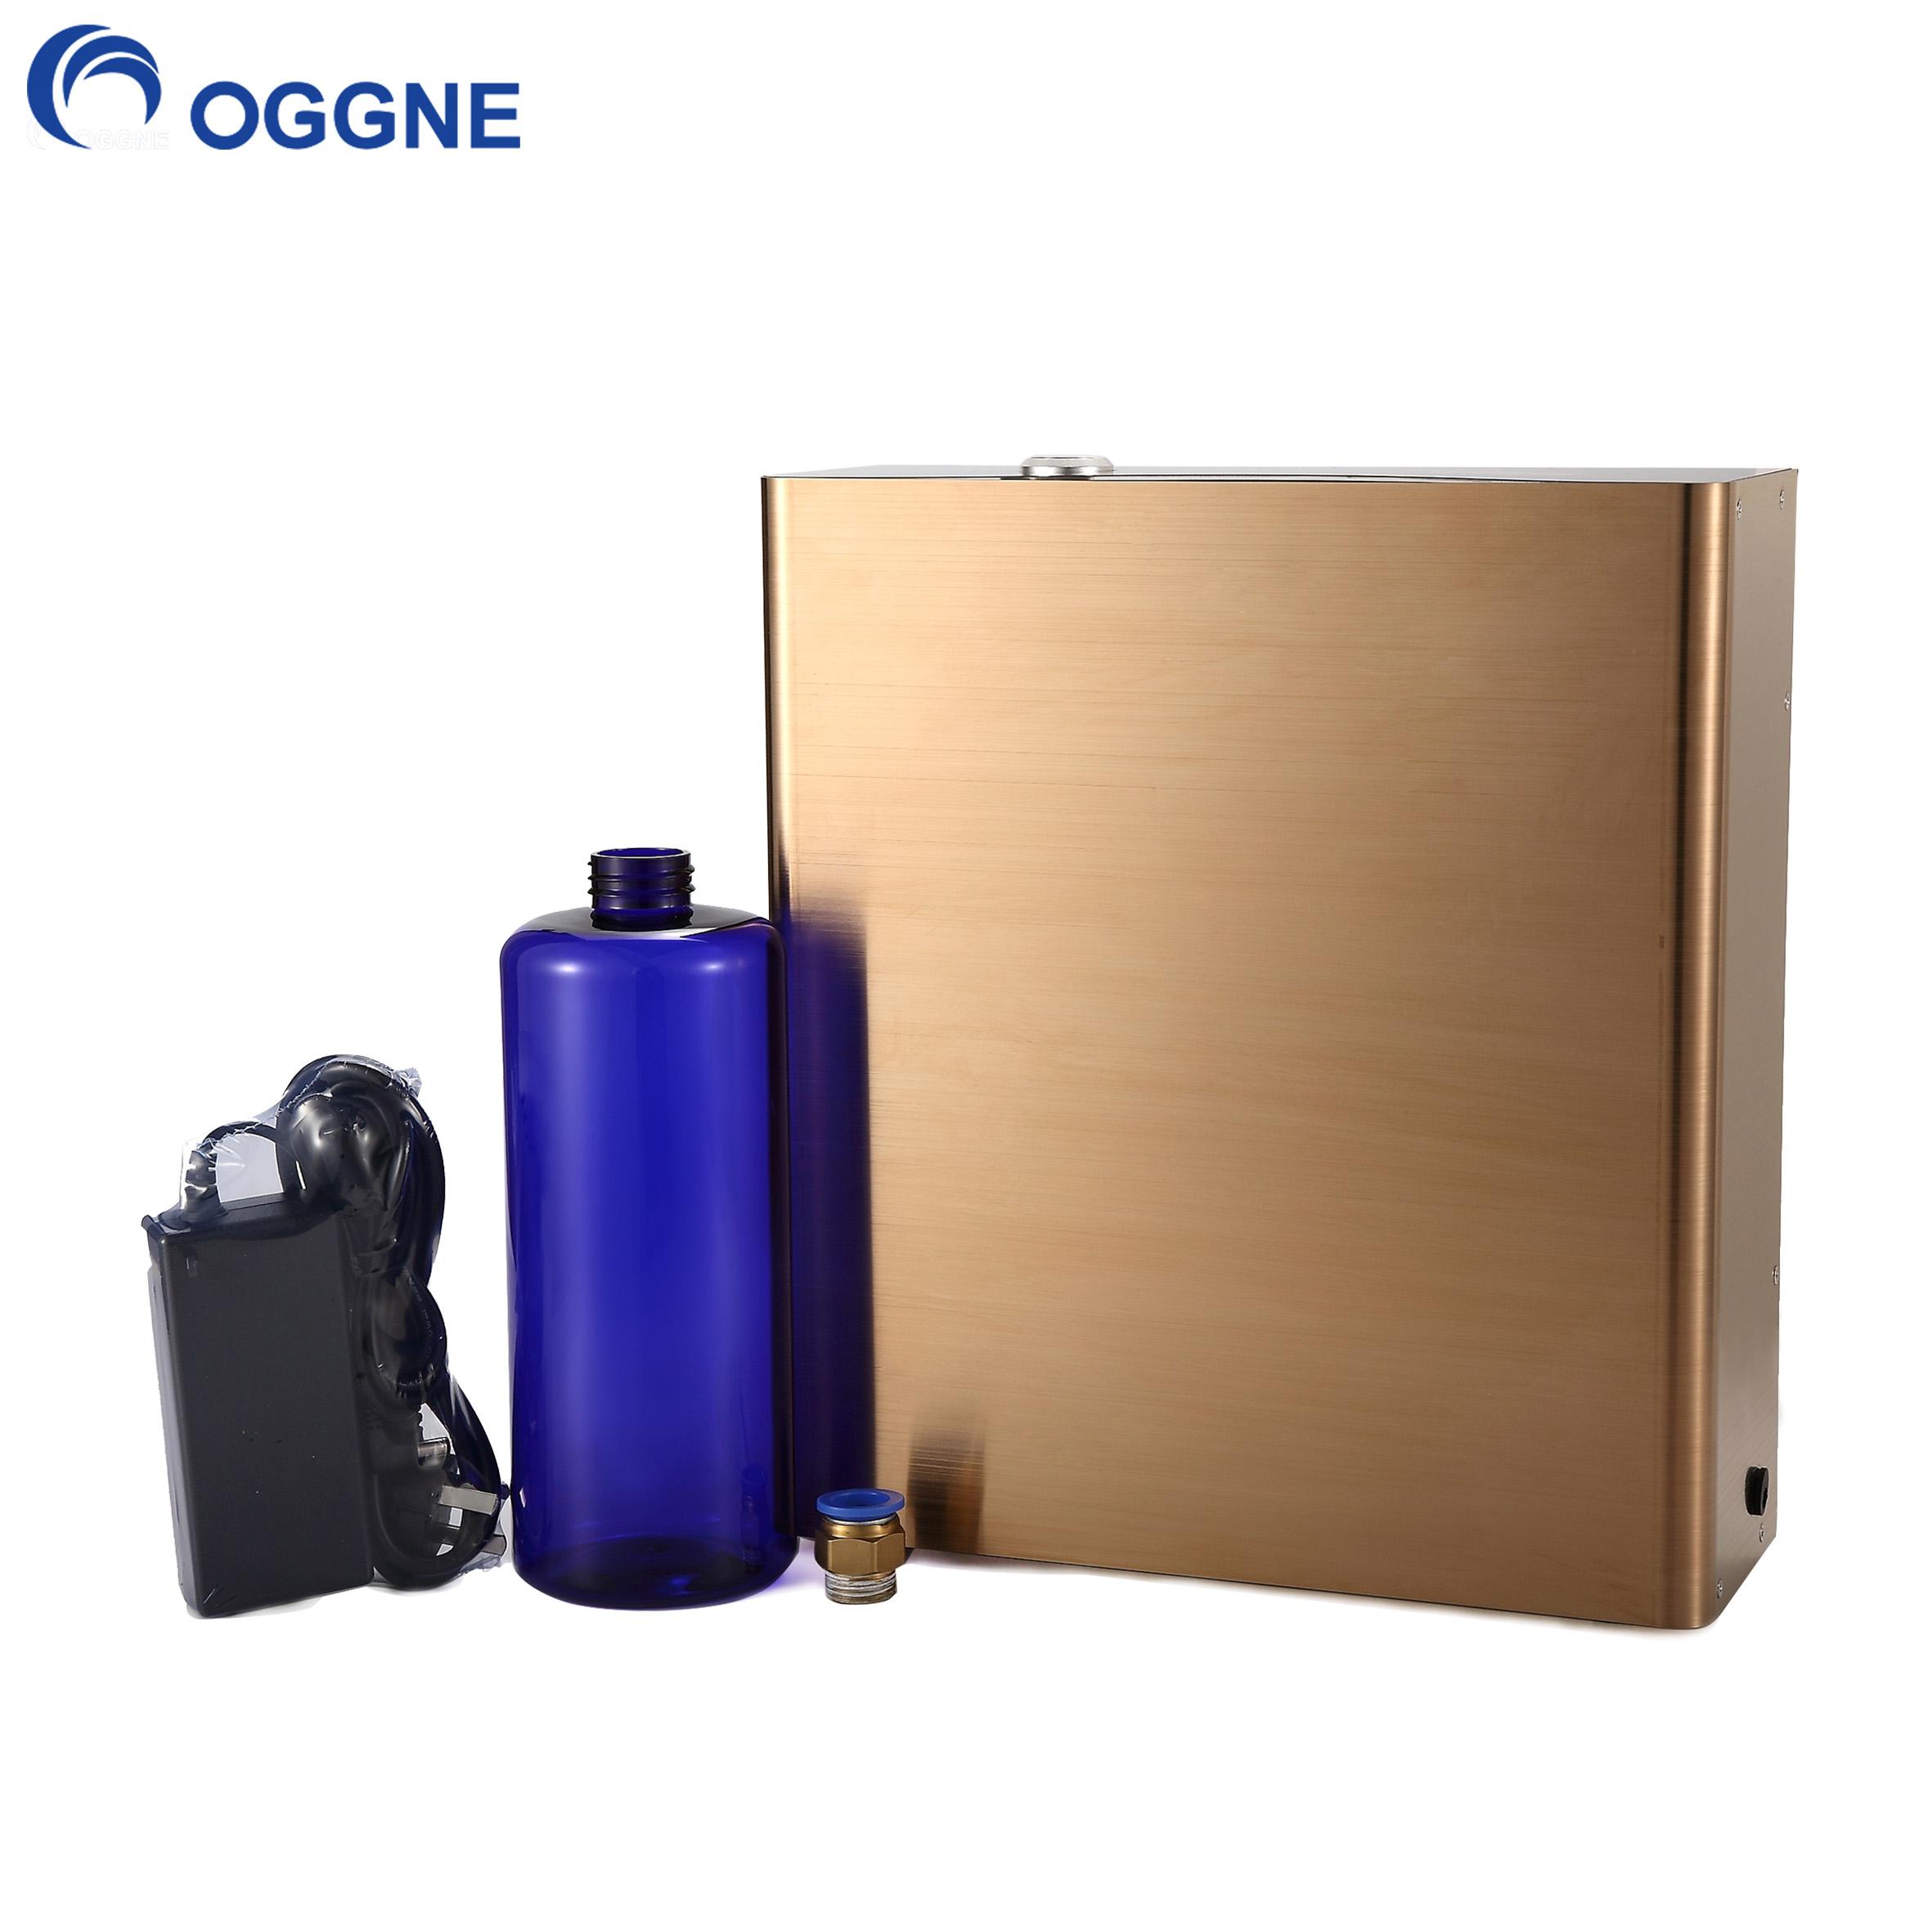 Modern design commercial scent diffuser India Market scent diffuser for hotel